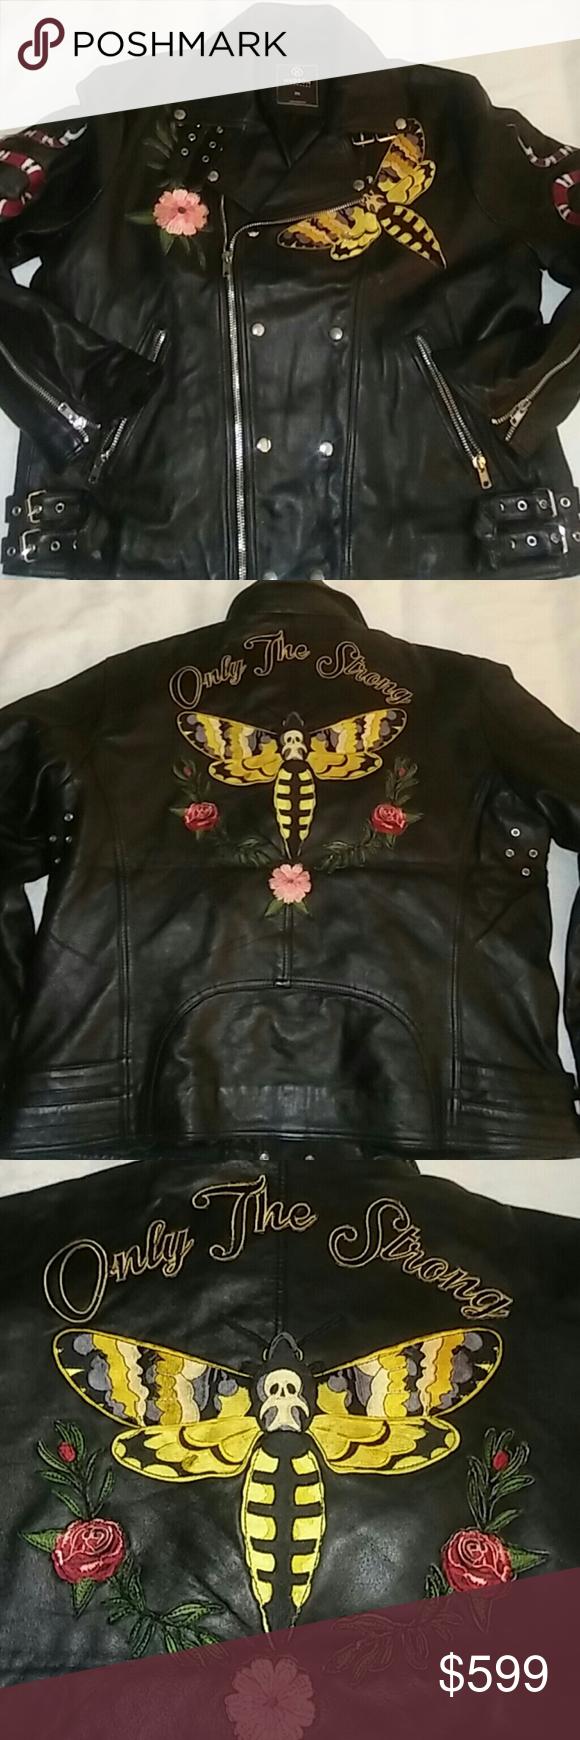 Men S Hudson Motorcycle Jacket Rare Motorcycle Jacket Hudson Jackets [ 1740 x 580 Pixel ]